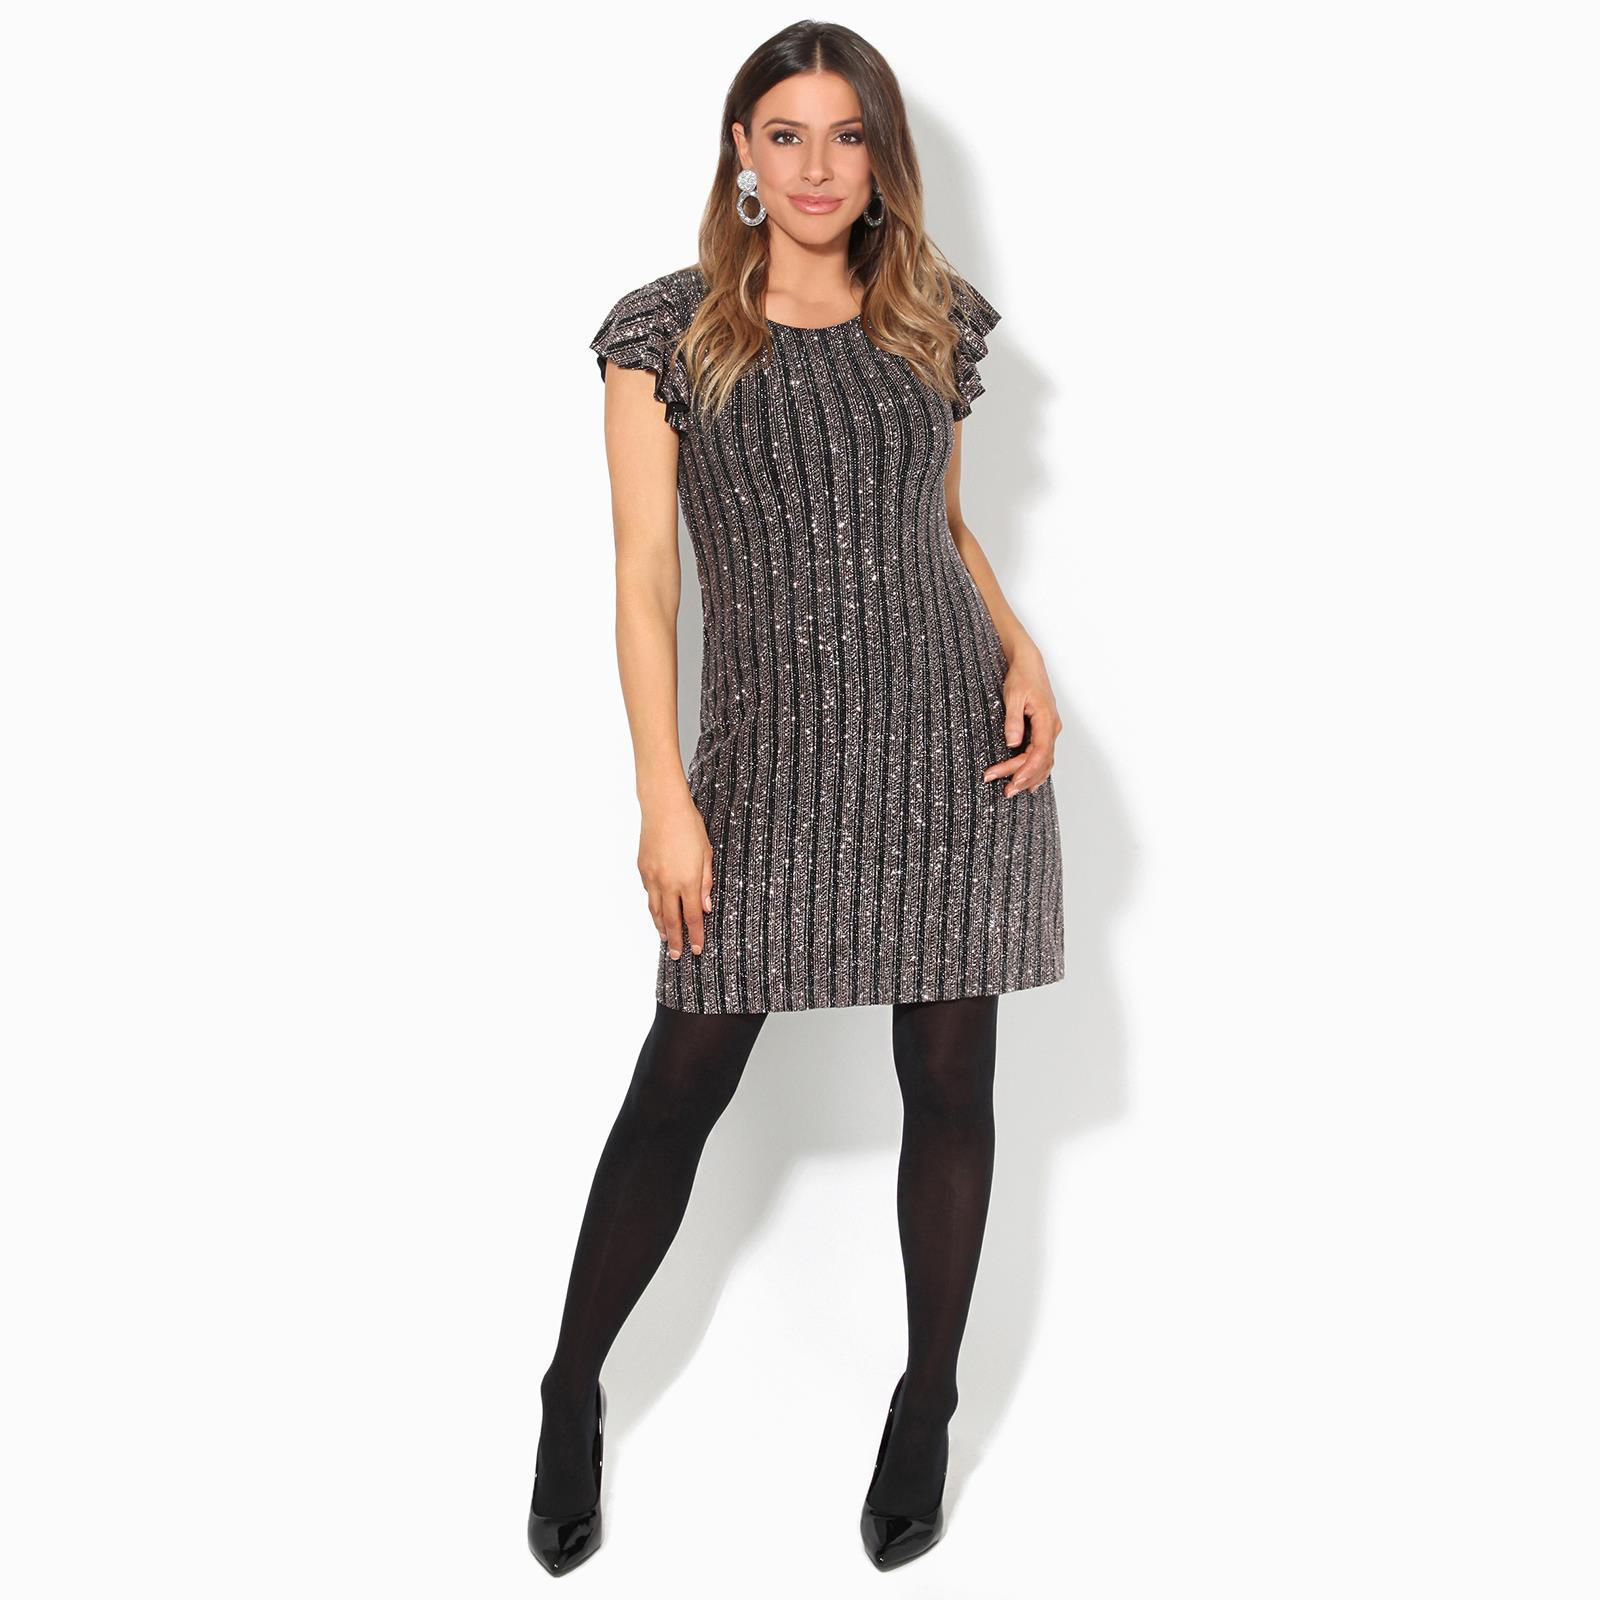 Womens-Ladies-Sequin-Glitter-Dress-Party-Ruffle-Sleeve-Evening-Lurex-Tunic-Top thumbnail 3